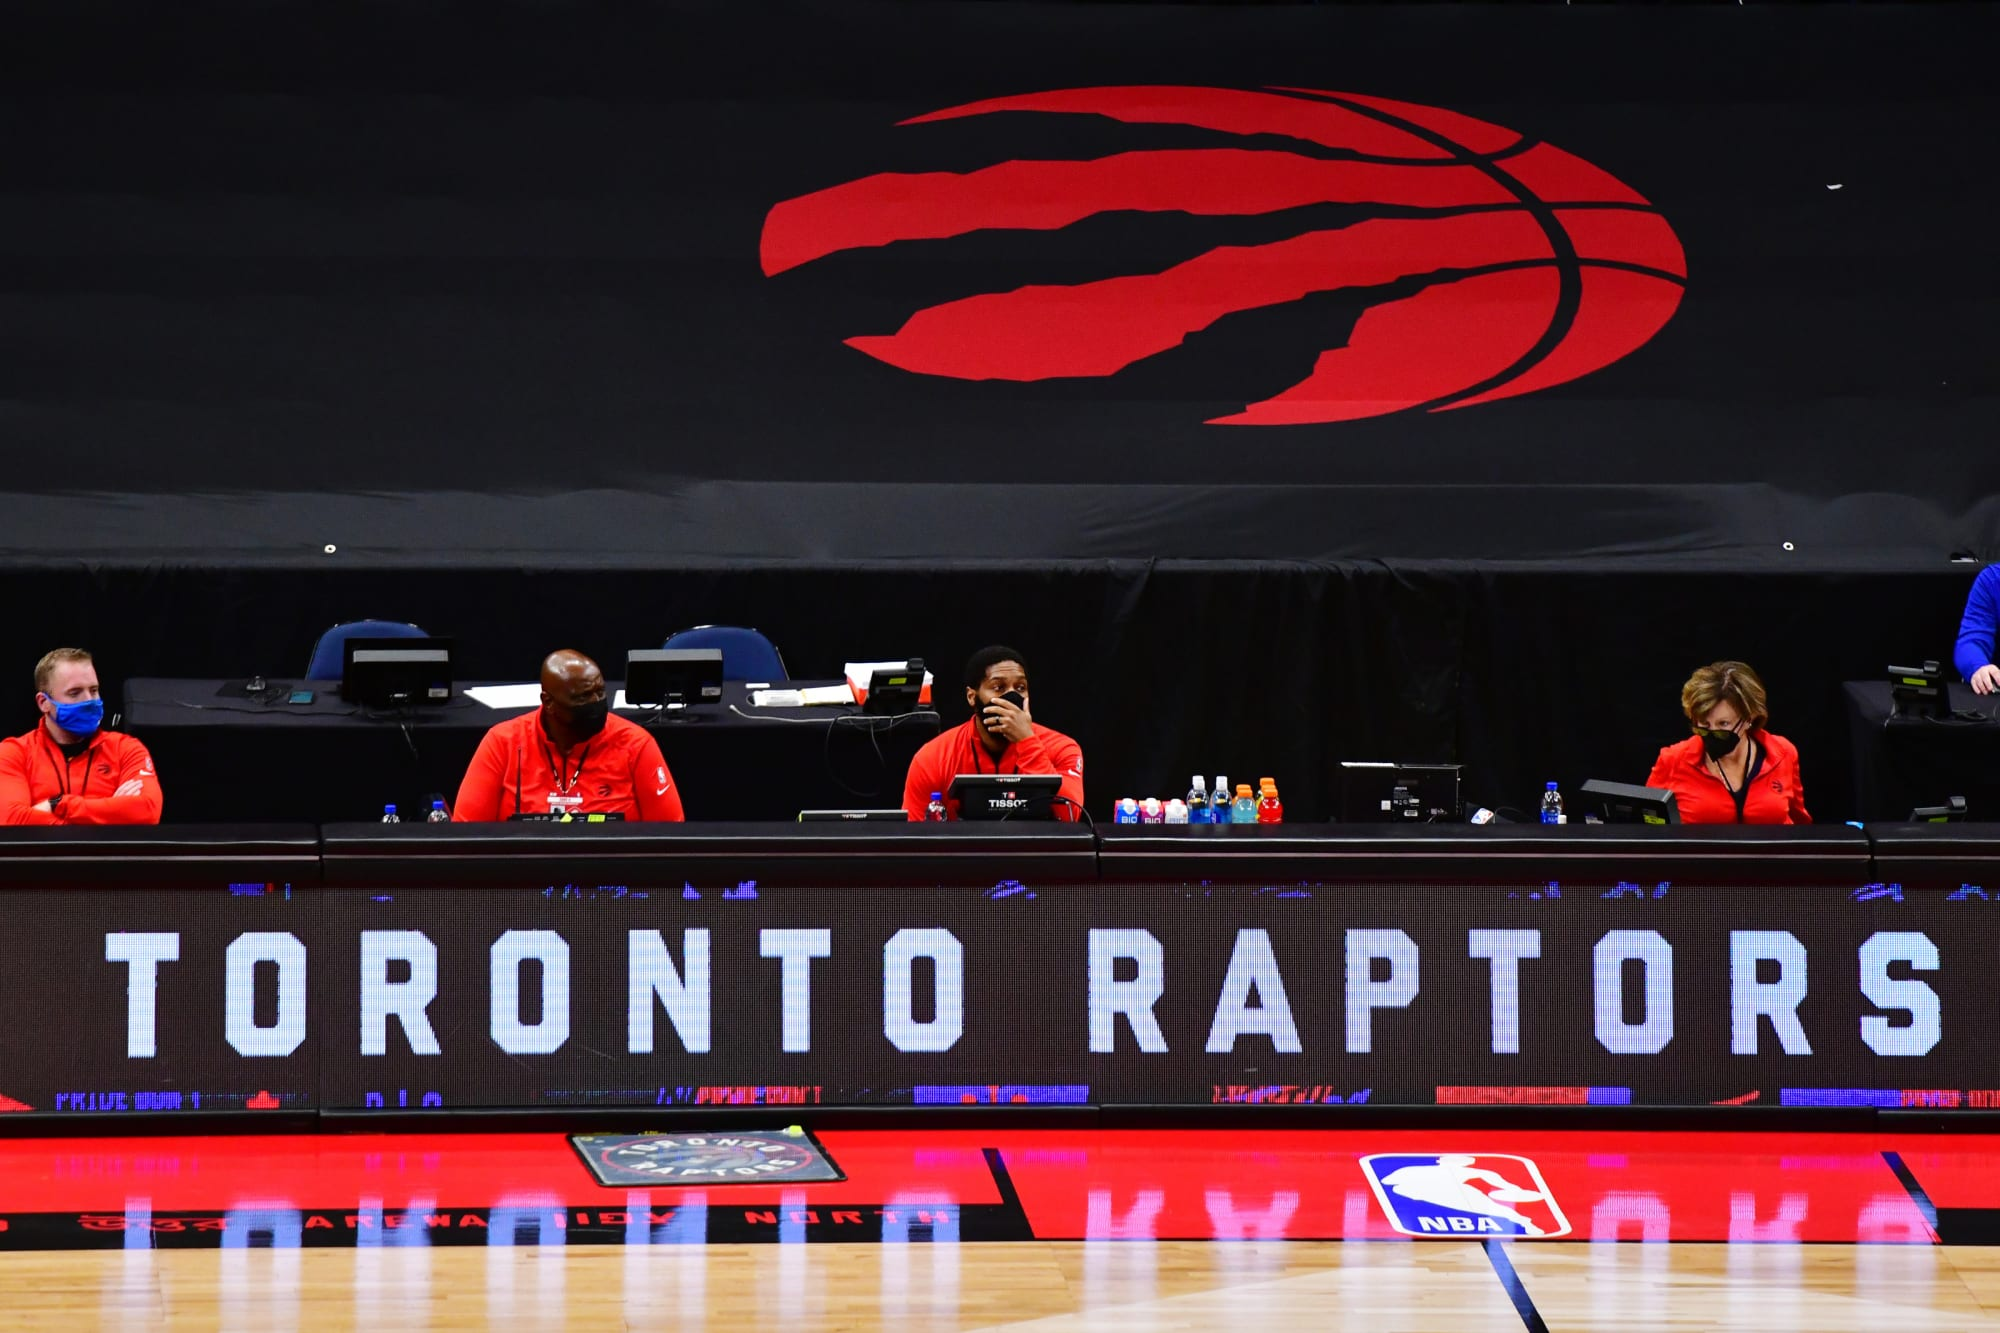 Toronto Raptors: 3 nightmare NBA Draft lottery scenarios